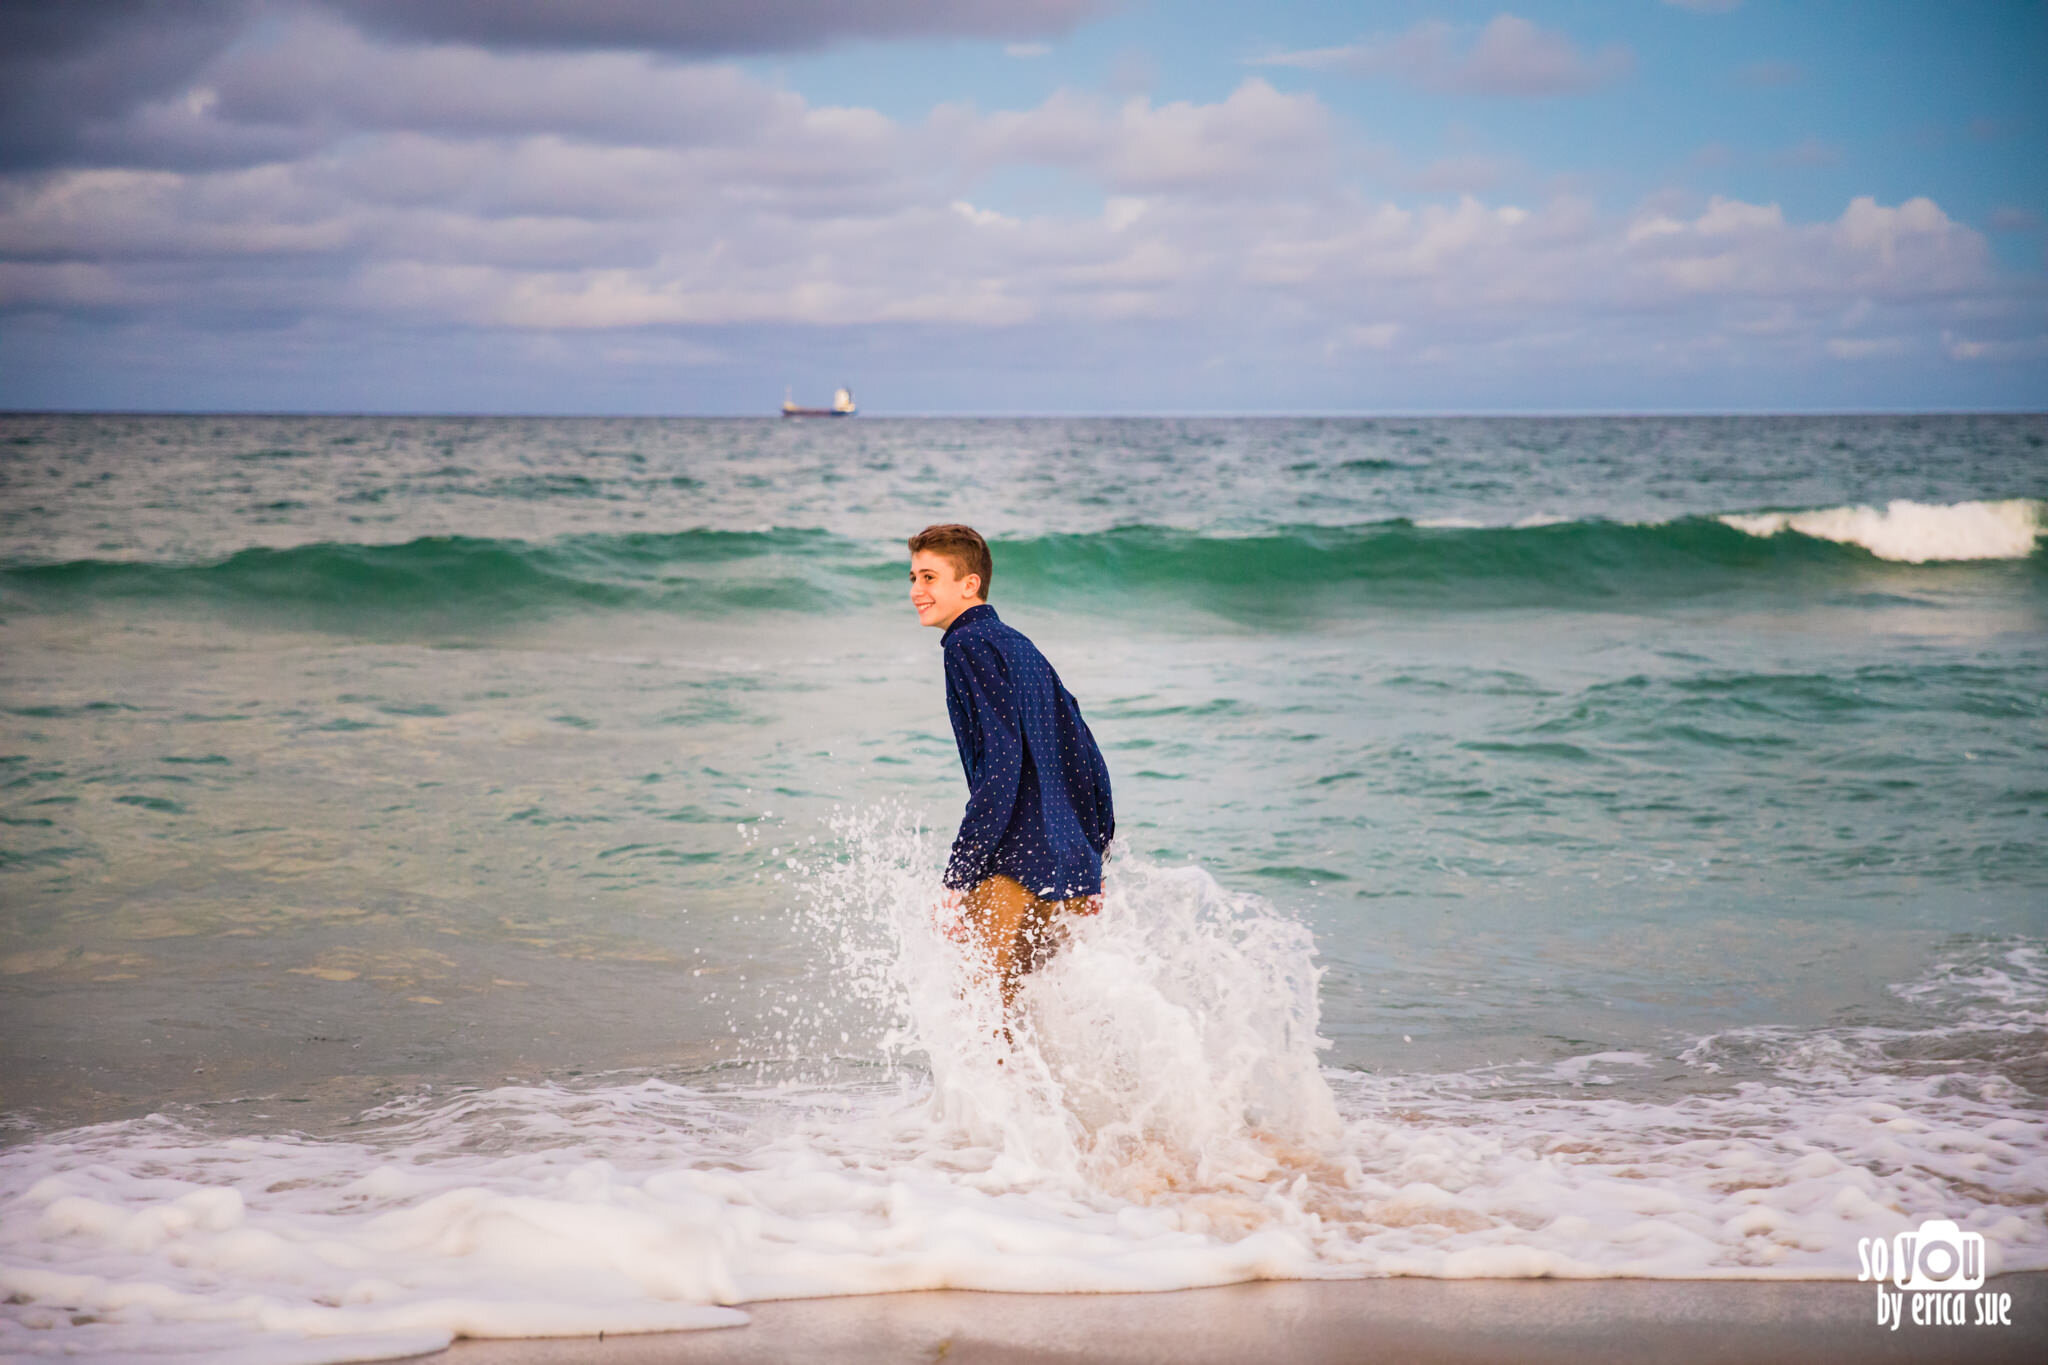 so-you-by-erica-sue-ft-lauderdale-beach-basketball-mitzvah-pre-shoot-9967.JPG